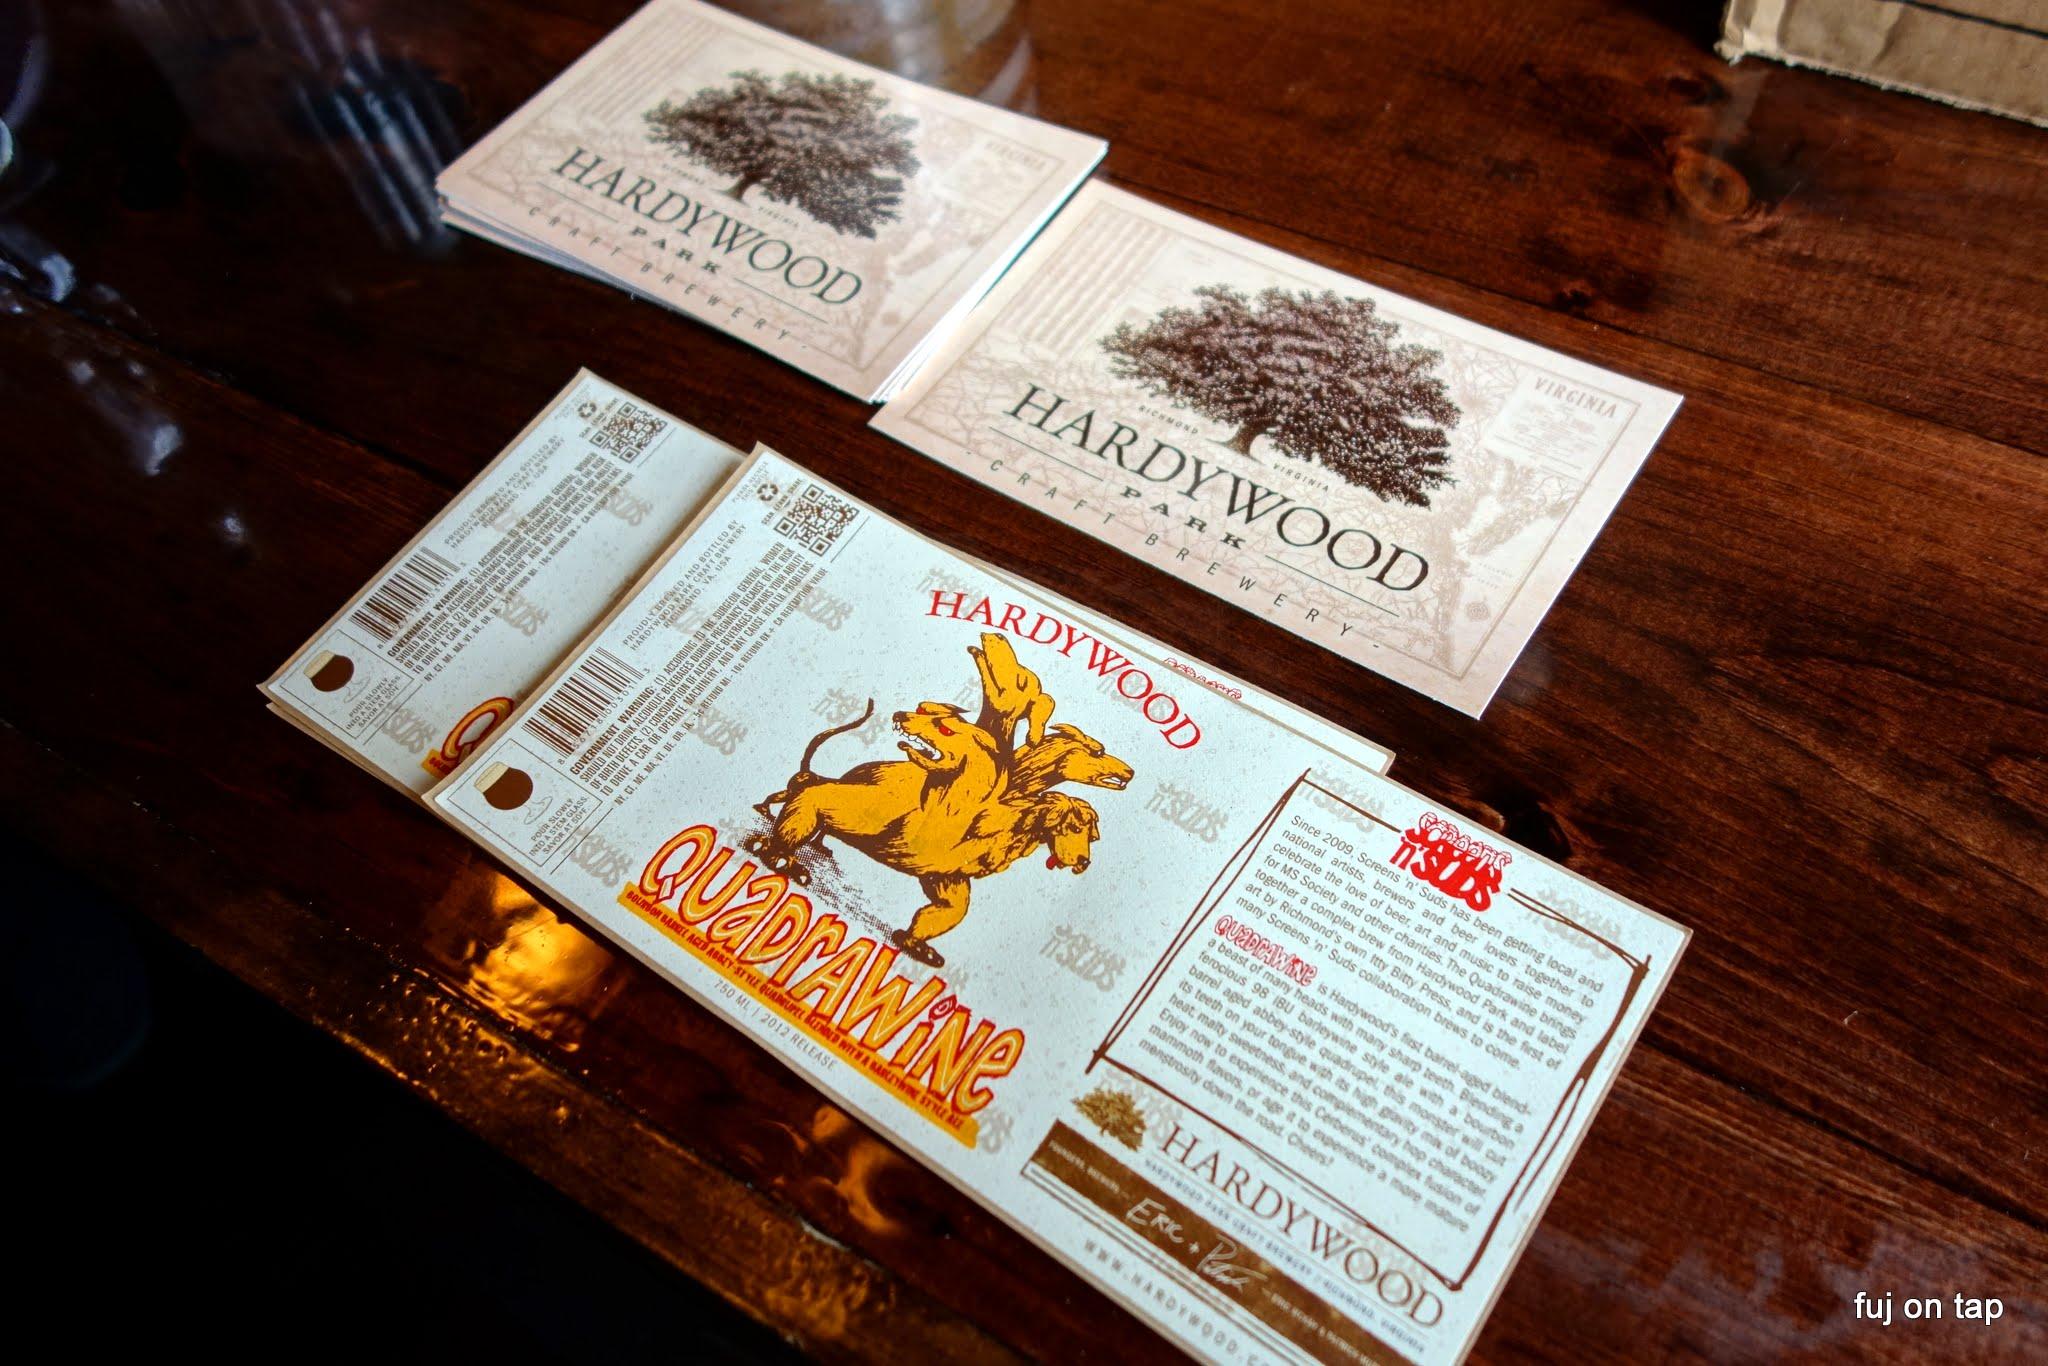 Hardywood Labels